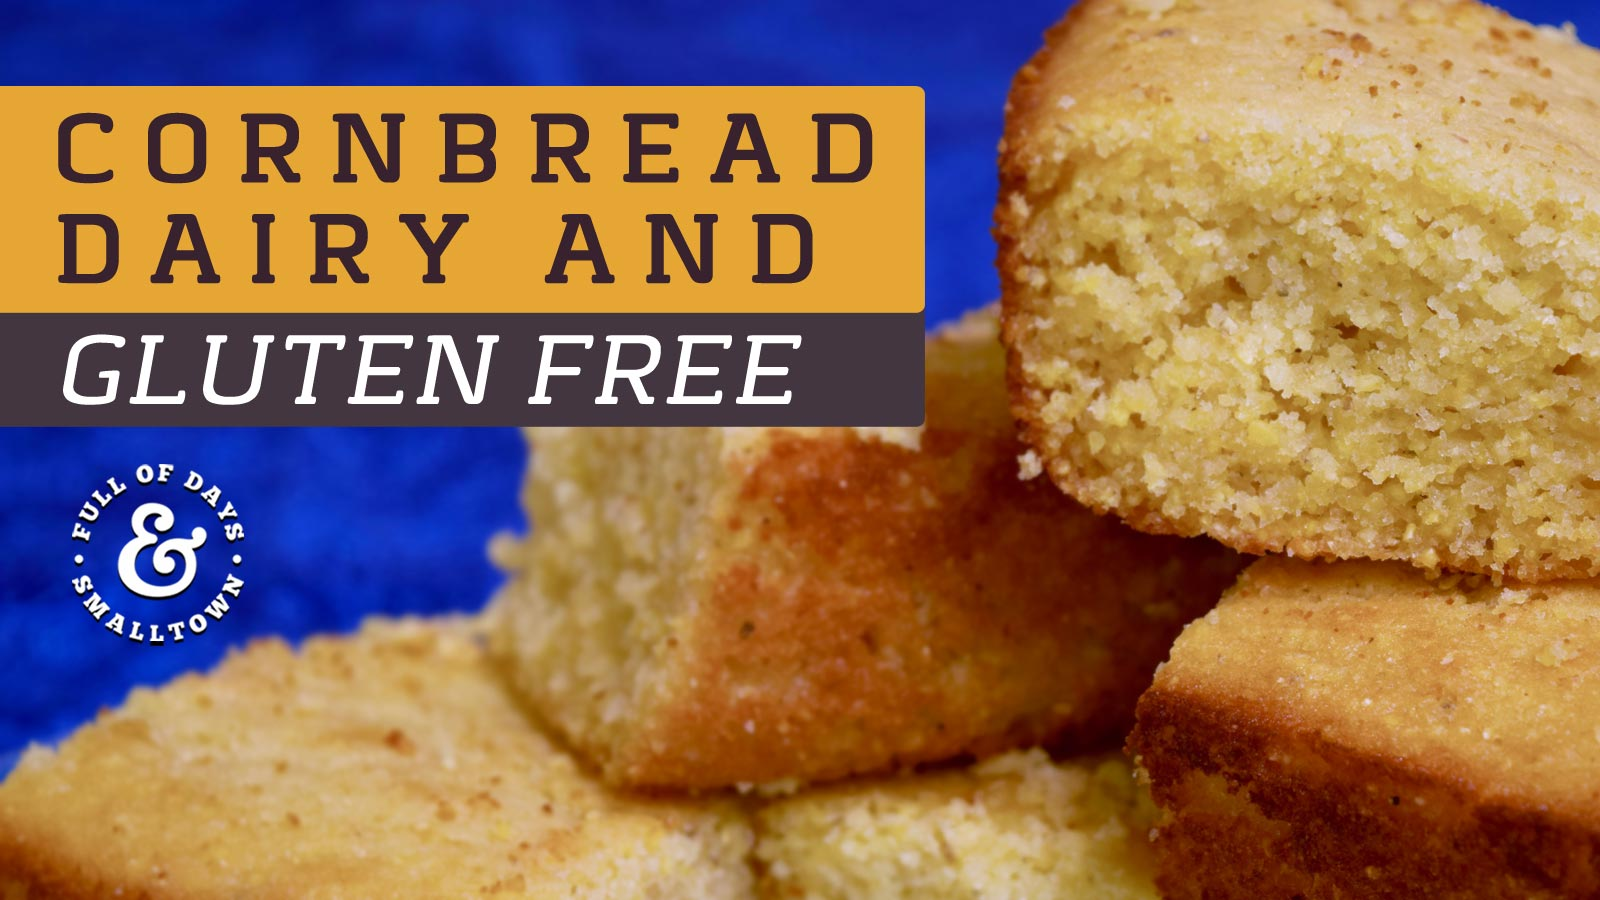 cornbread-recipe_gluten-free_full-of-days_1600-x-900